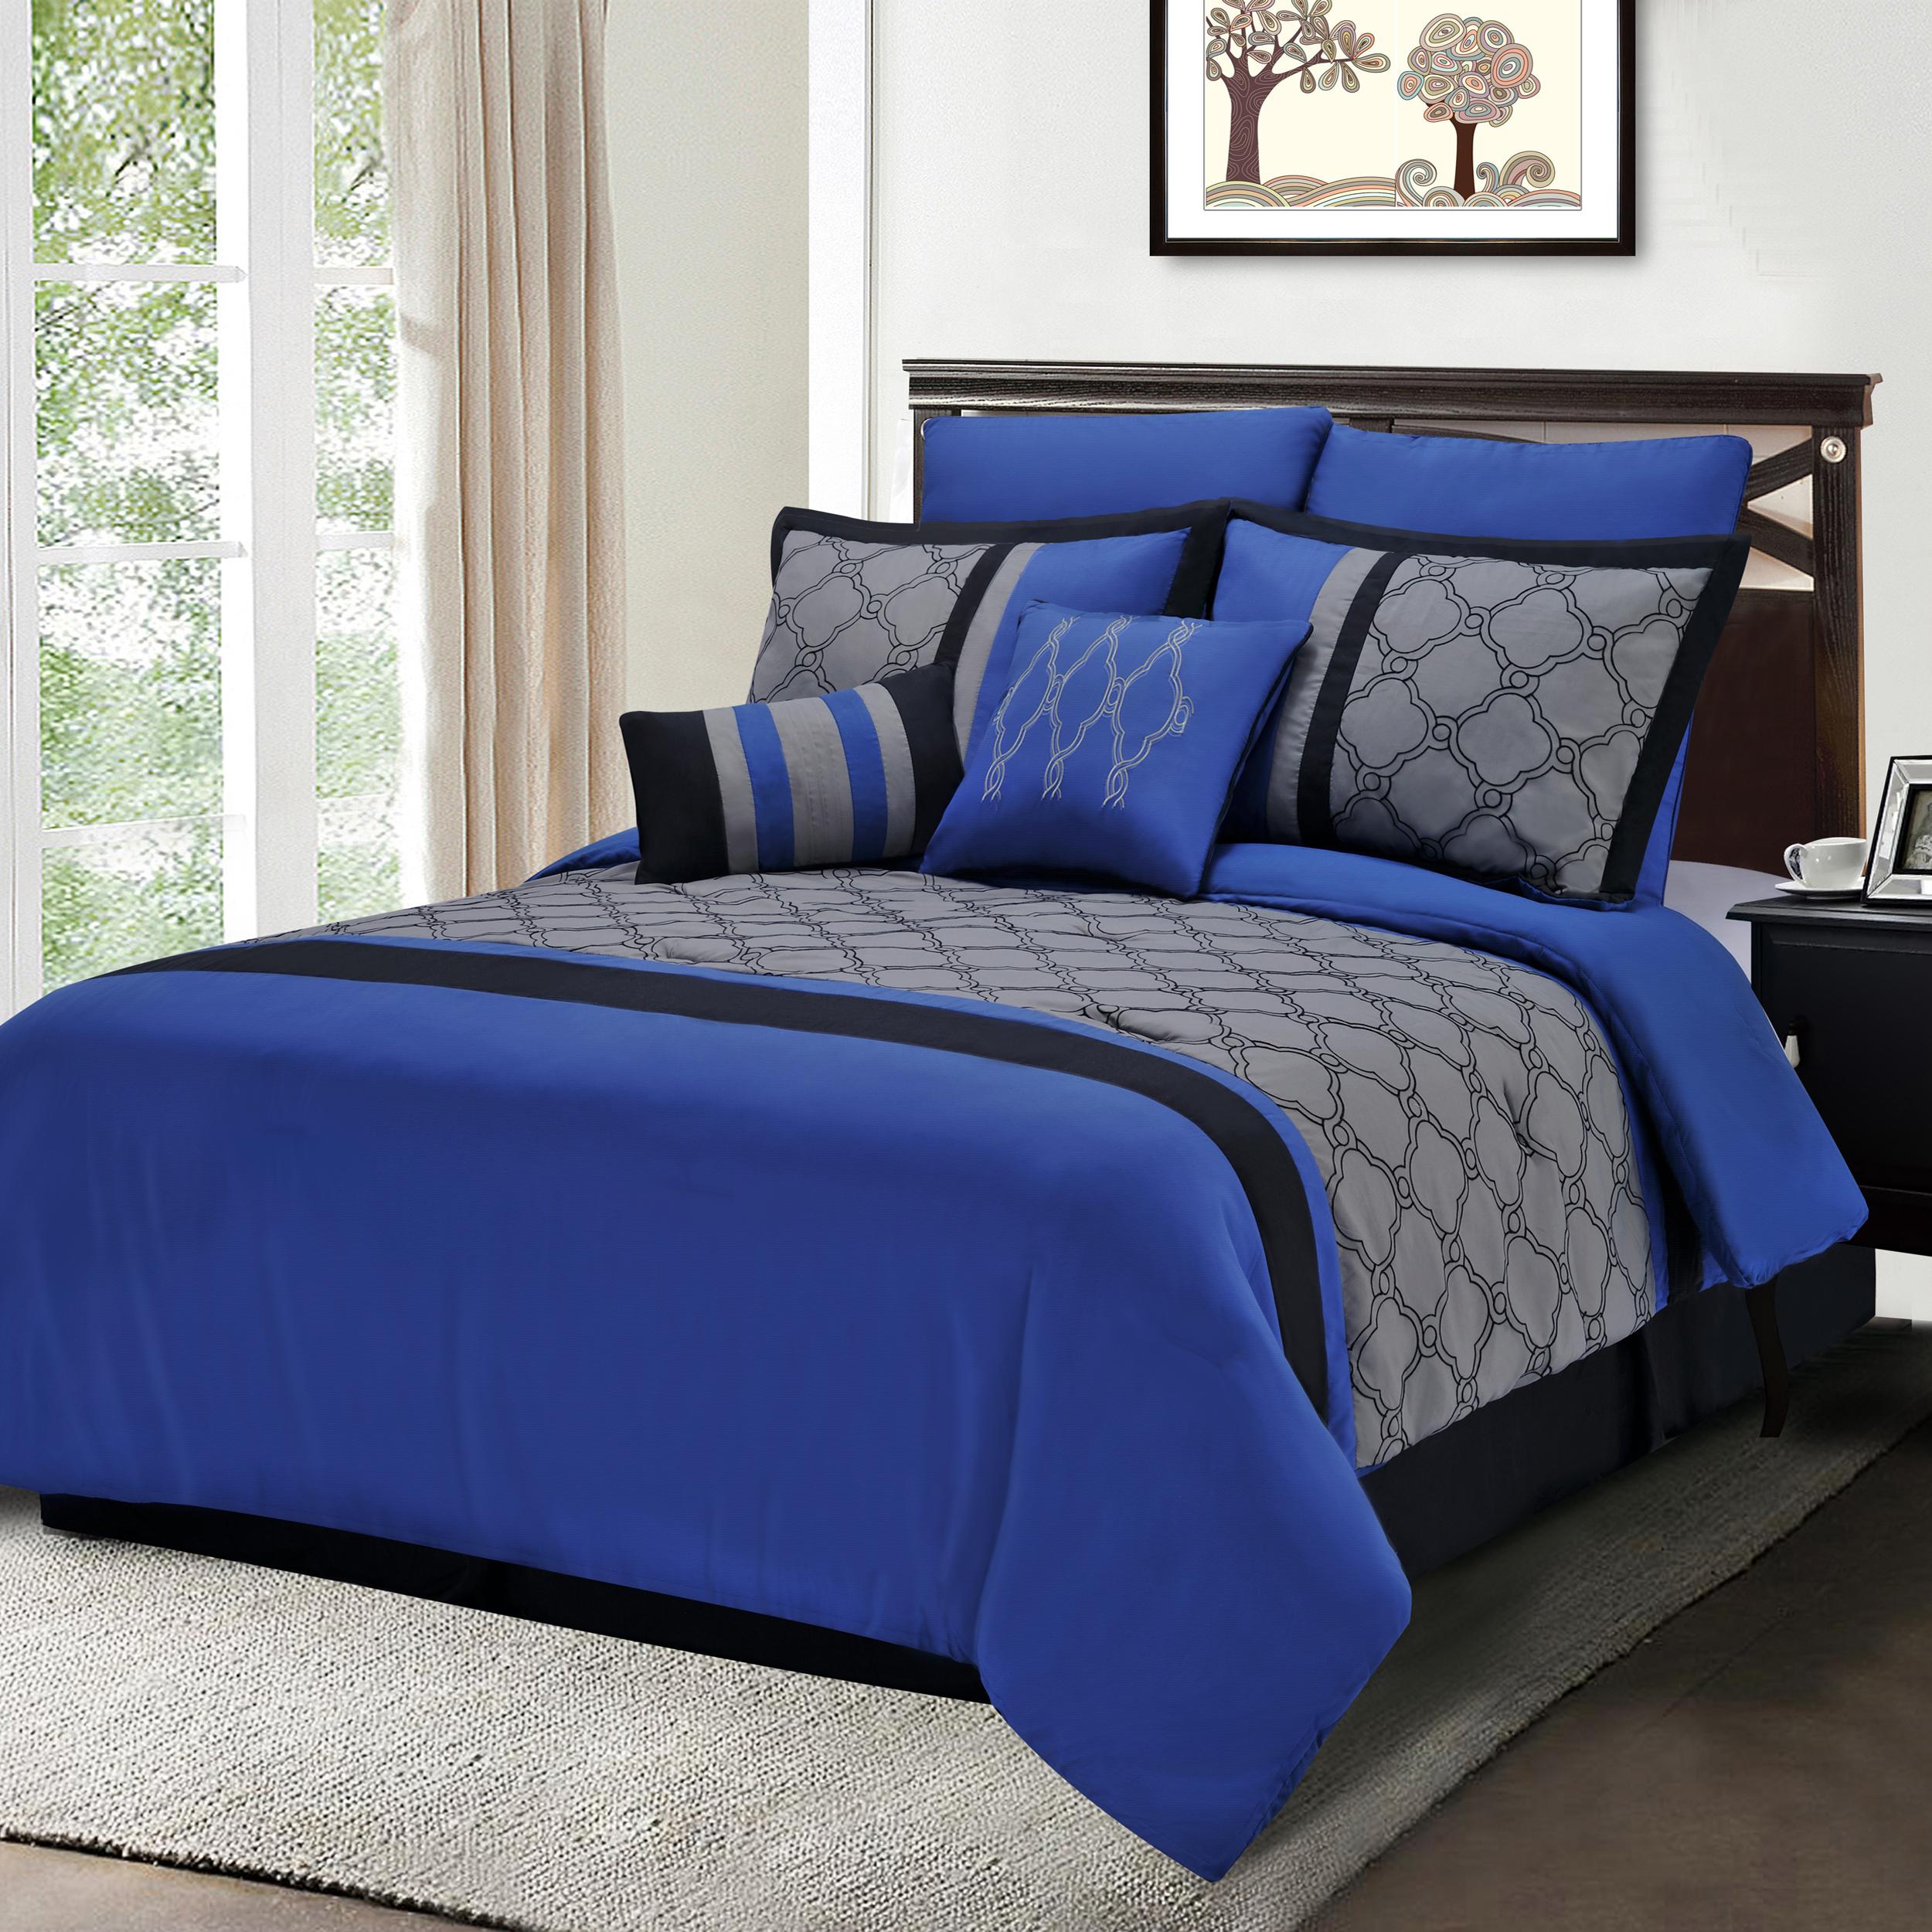 Decorative Bed Pillow Sets : 7-12-Piece Bedding Comforter Set, Shams, Decorative Pillows, 13 Designs eBay